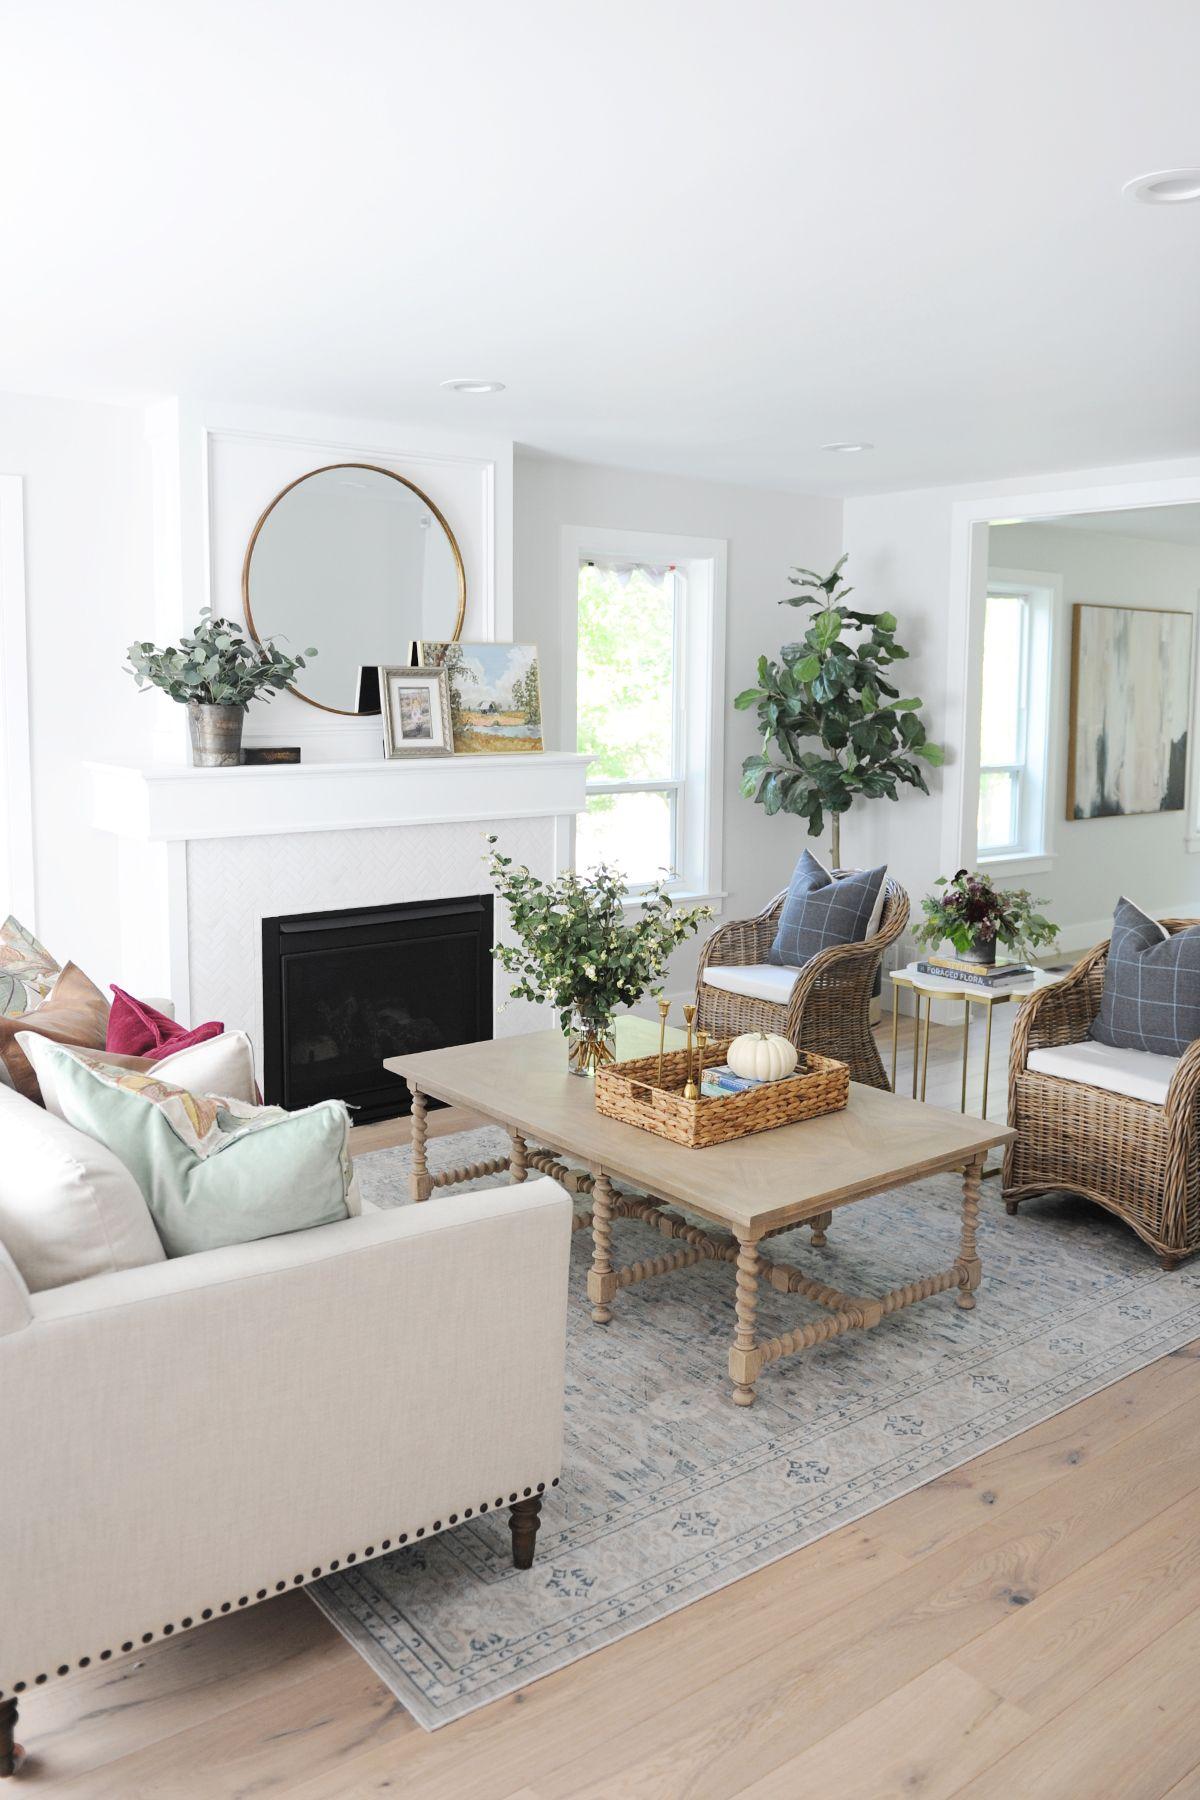 30 Beautiful Fall Home Decorating Ideas Home Decor Autumn Living Room Room Decor